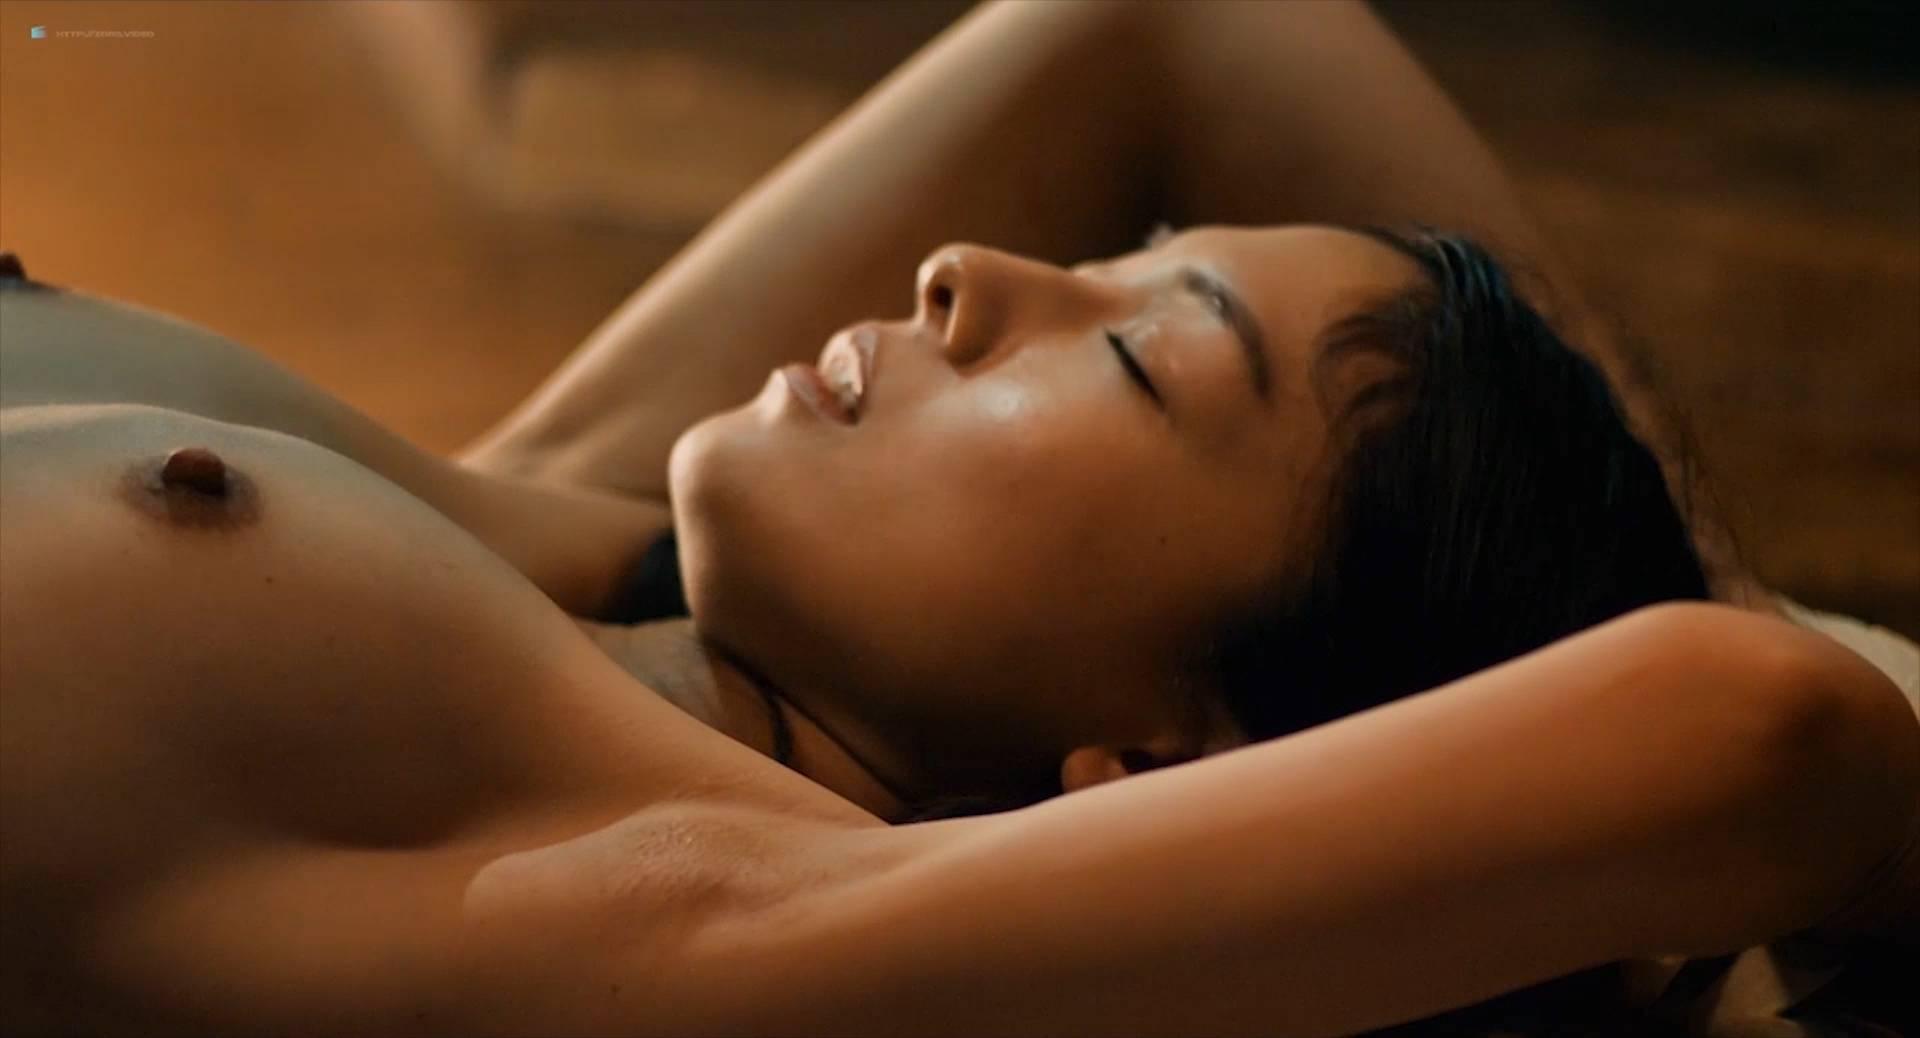 Kokone Sasaki nude hot sex Ayano Moriguchi and Aina Yamada all nude sex too - The Lowlife (JP-2017) HD 1080p (6)